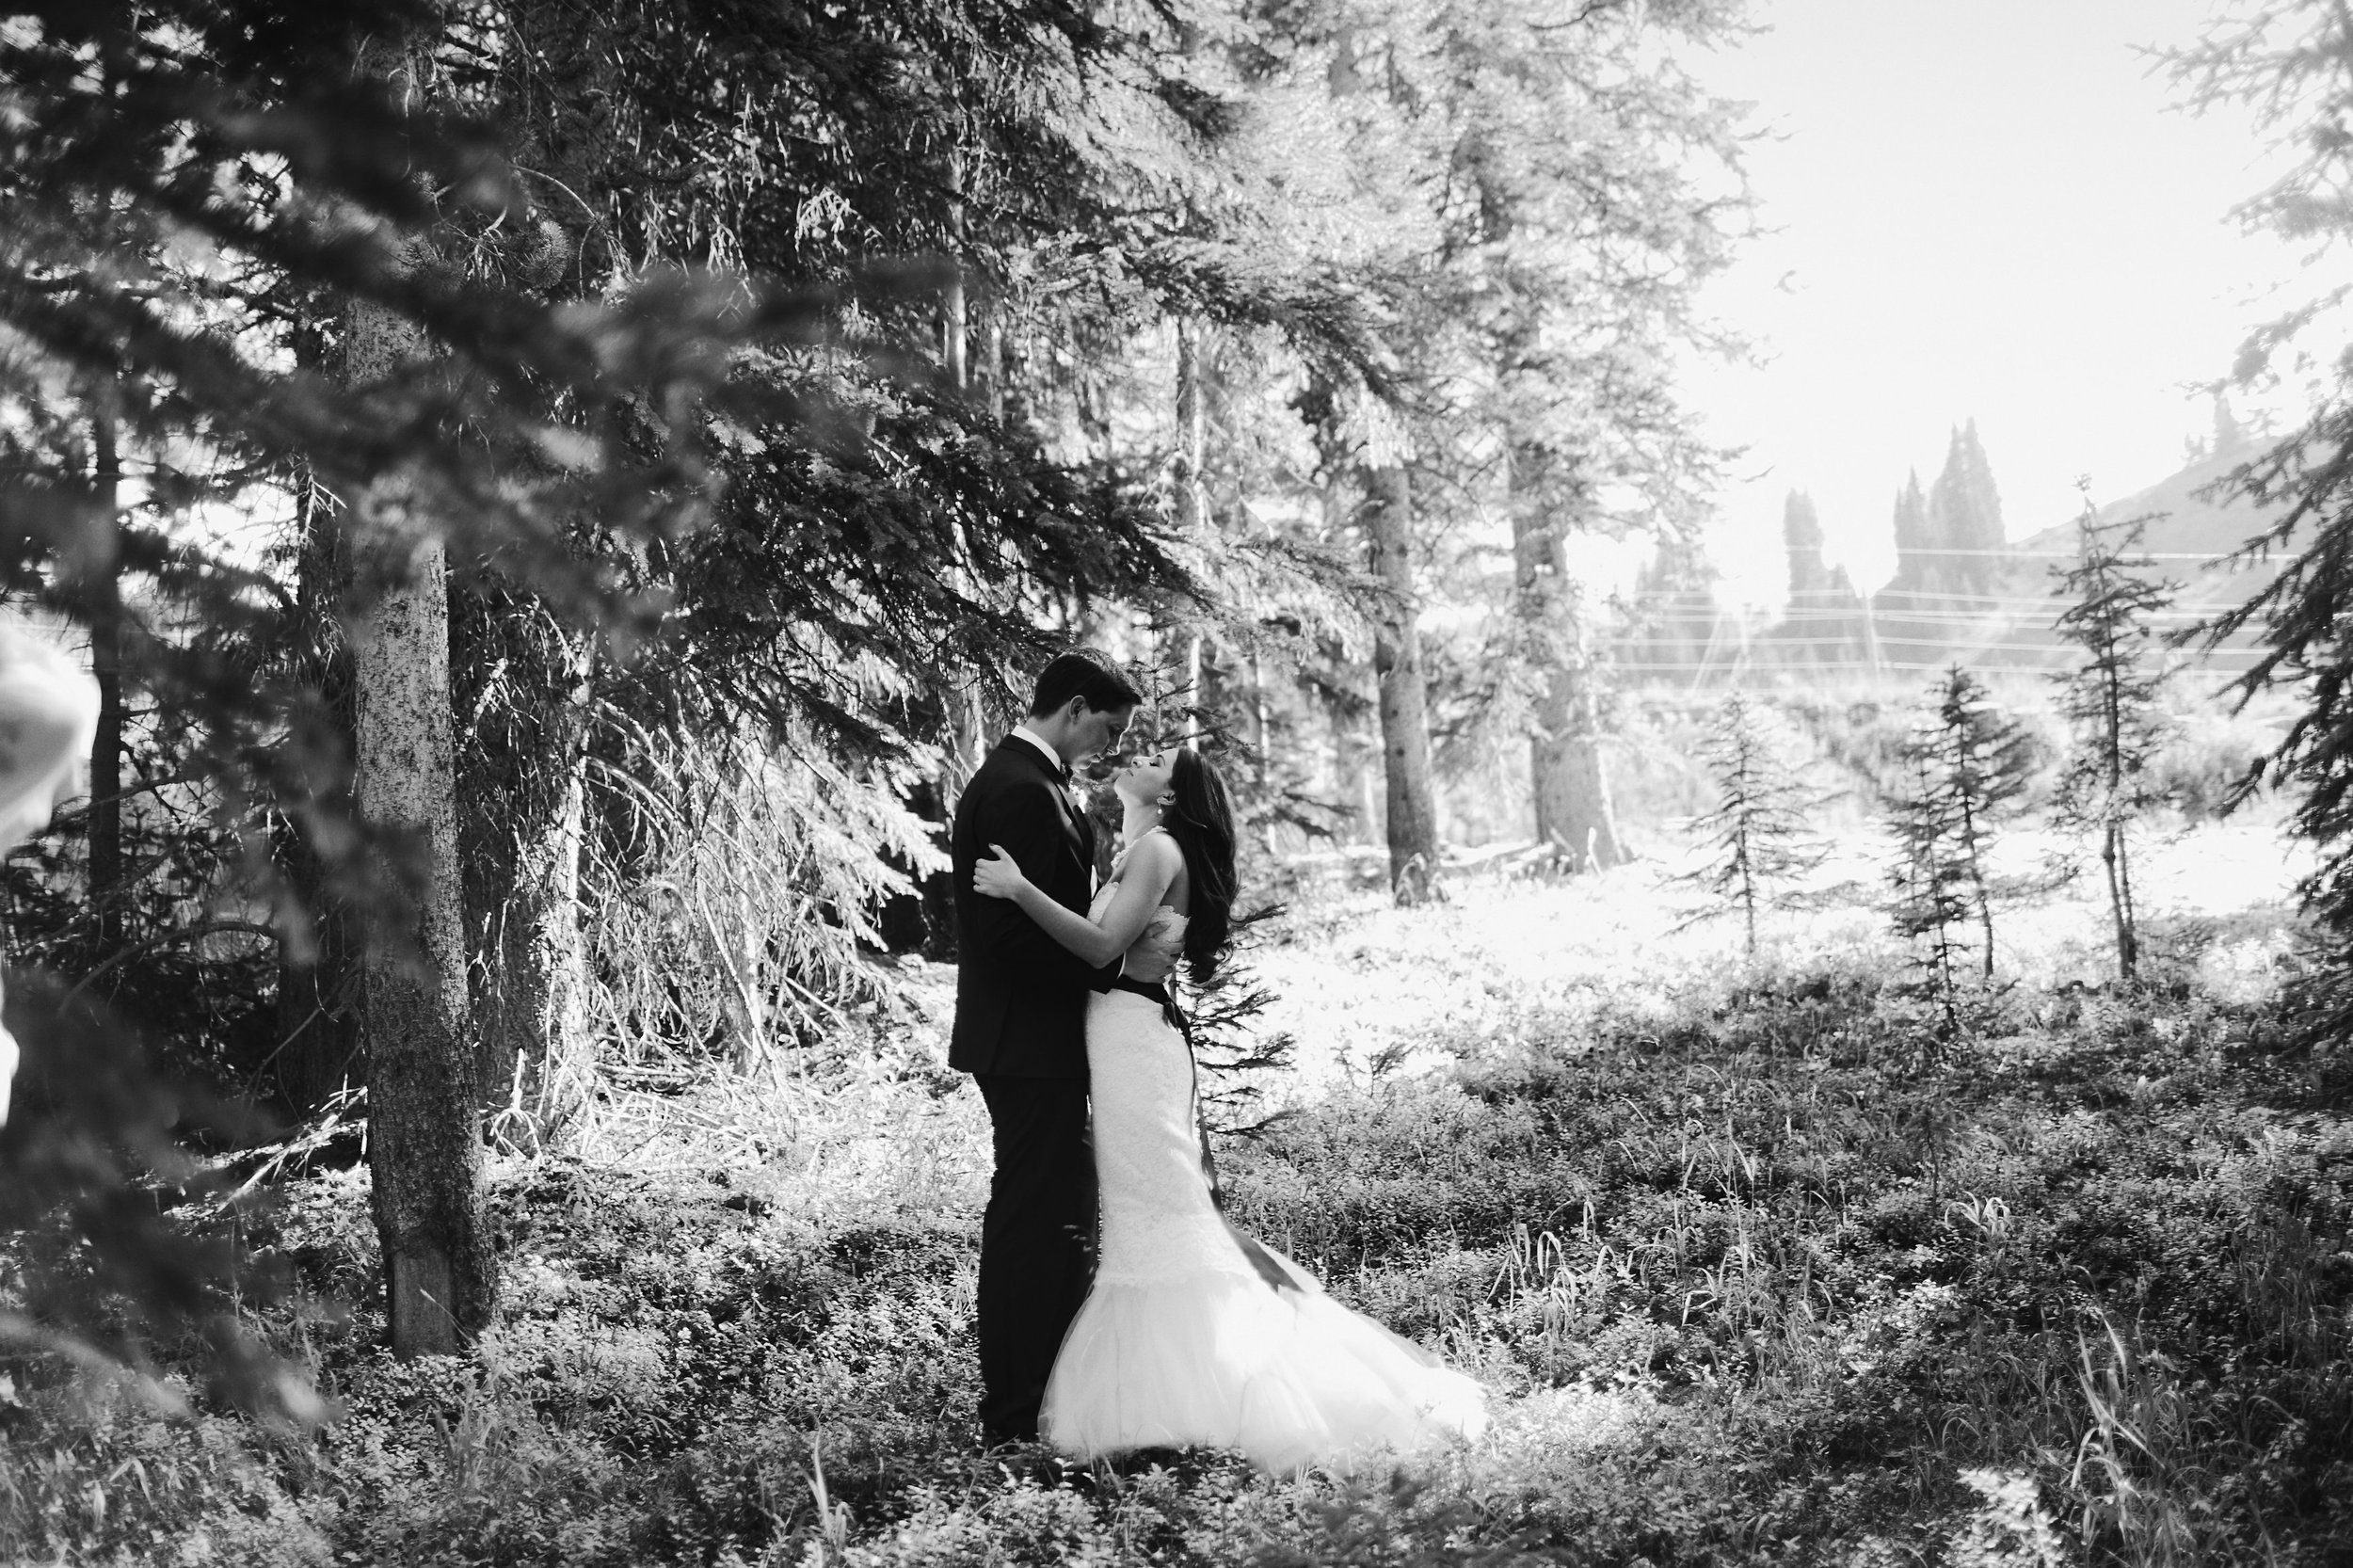 Jenny_Jeff_Vail_Wedding_13.jpg